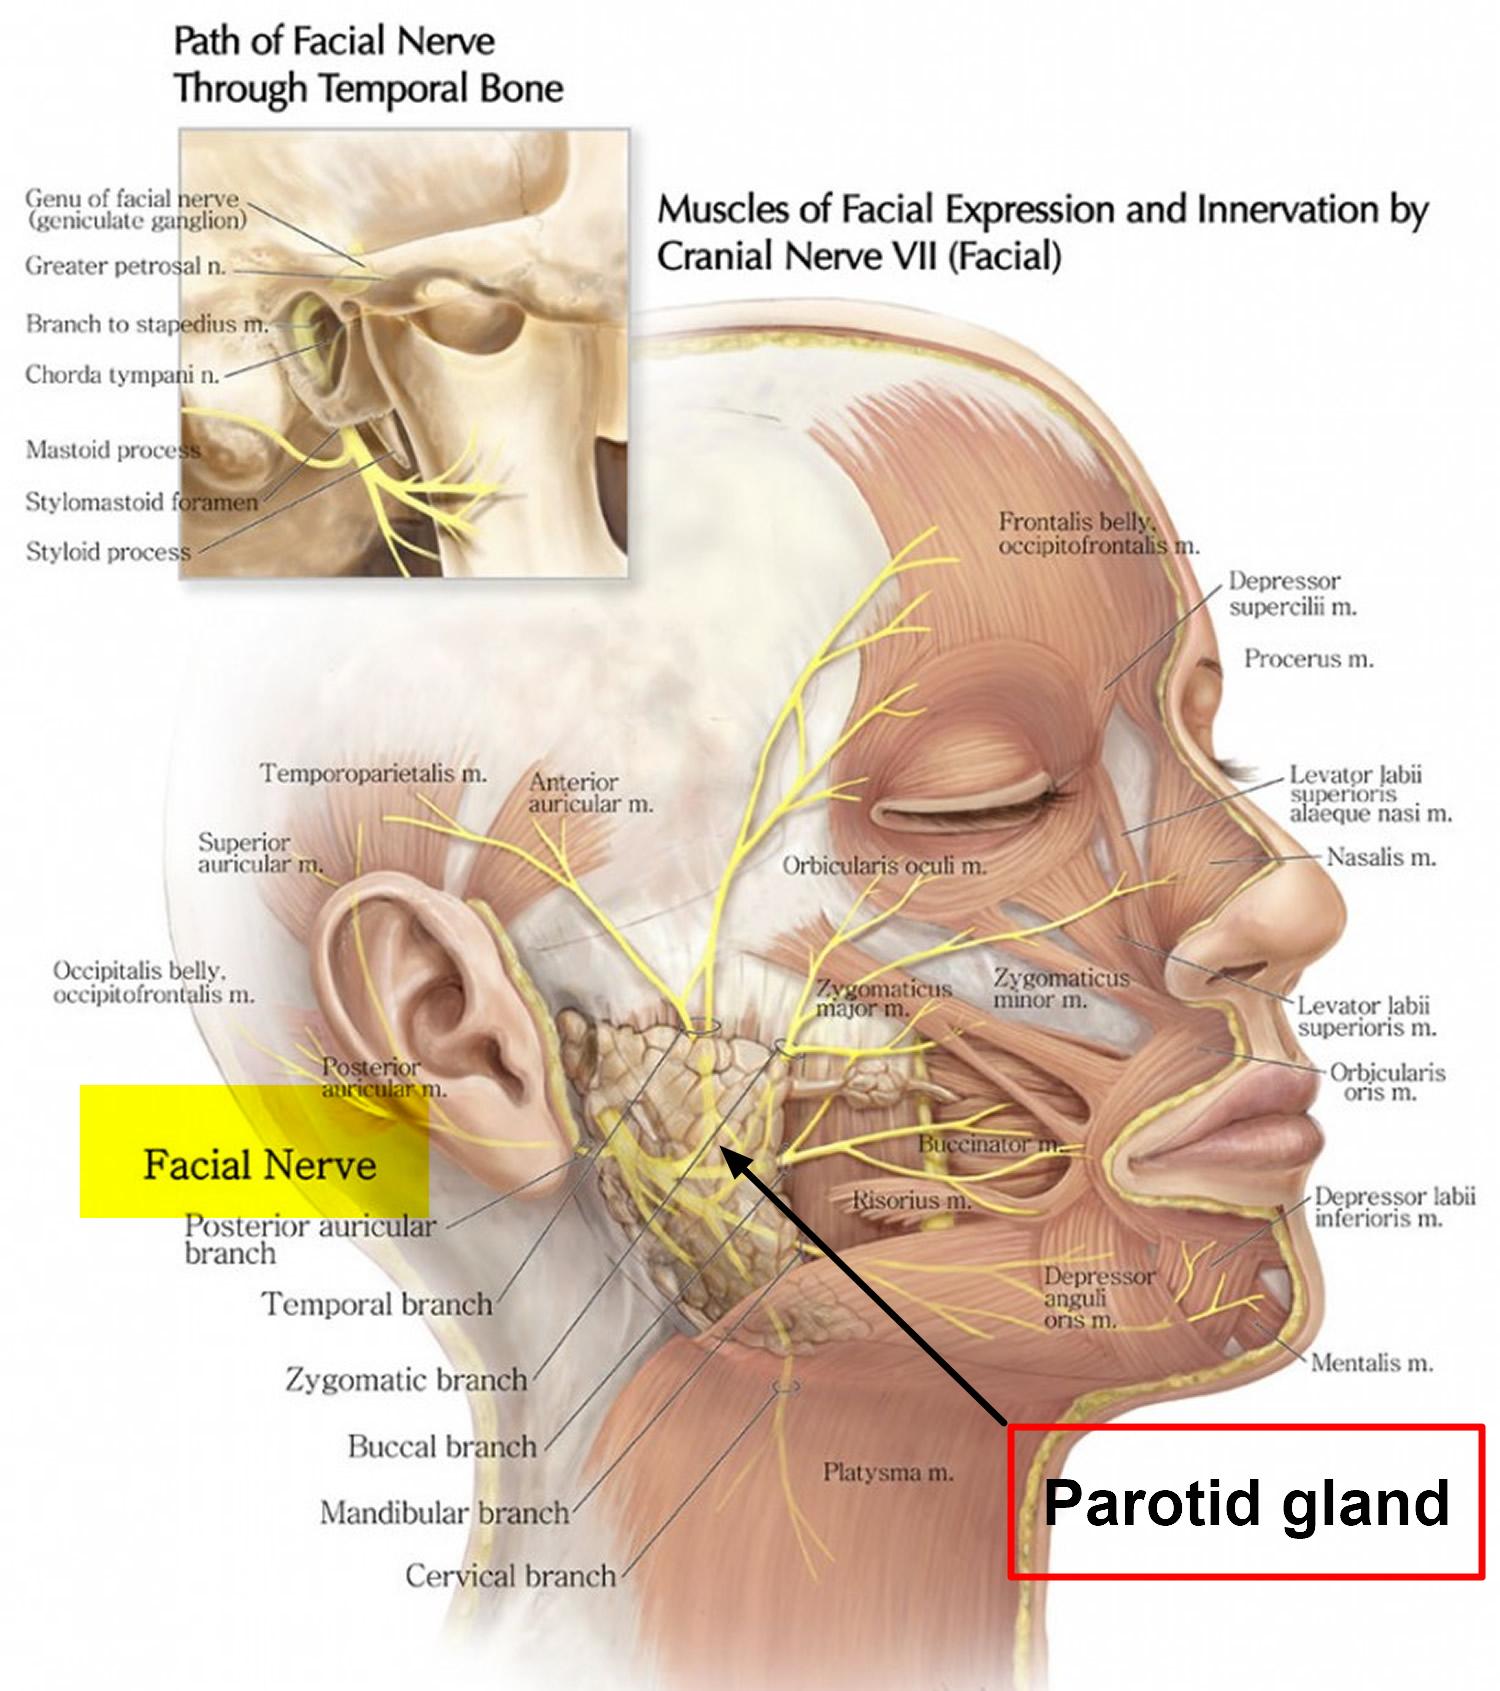 anatomy digestive diagram salivary glands deer kill zone parotid tumor causes symptoms diagnosis surgery